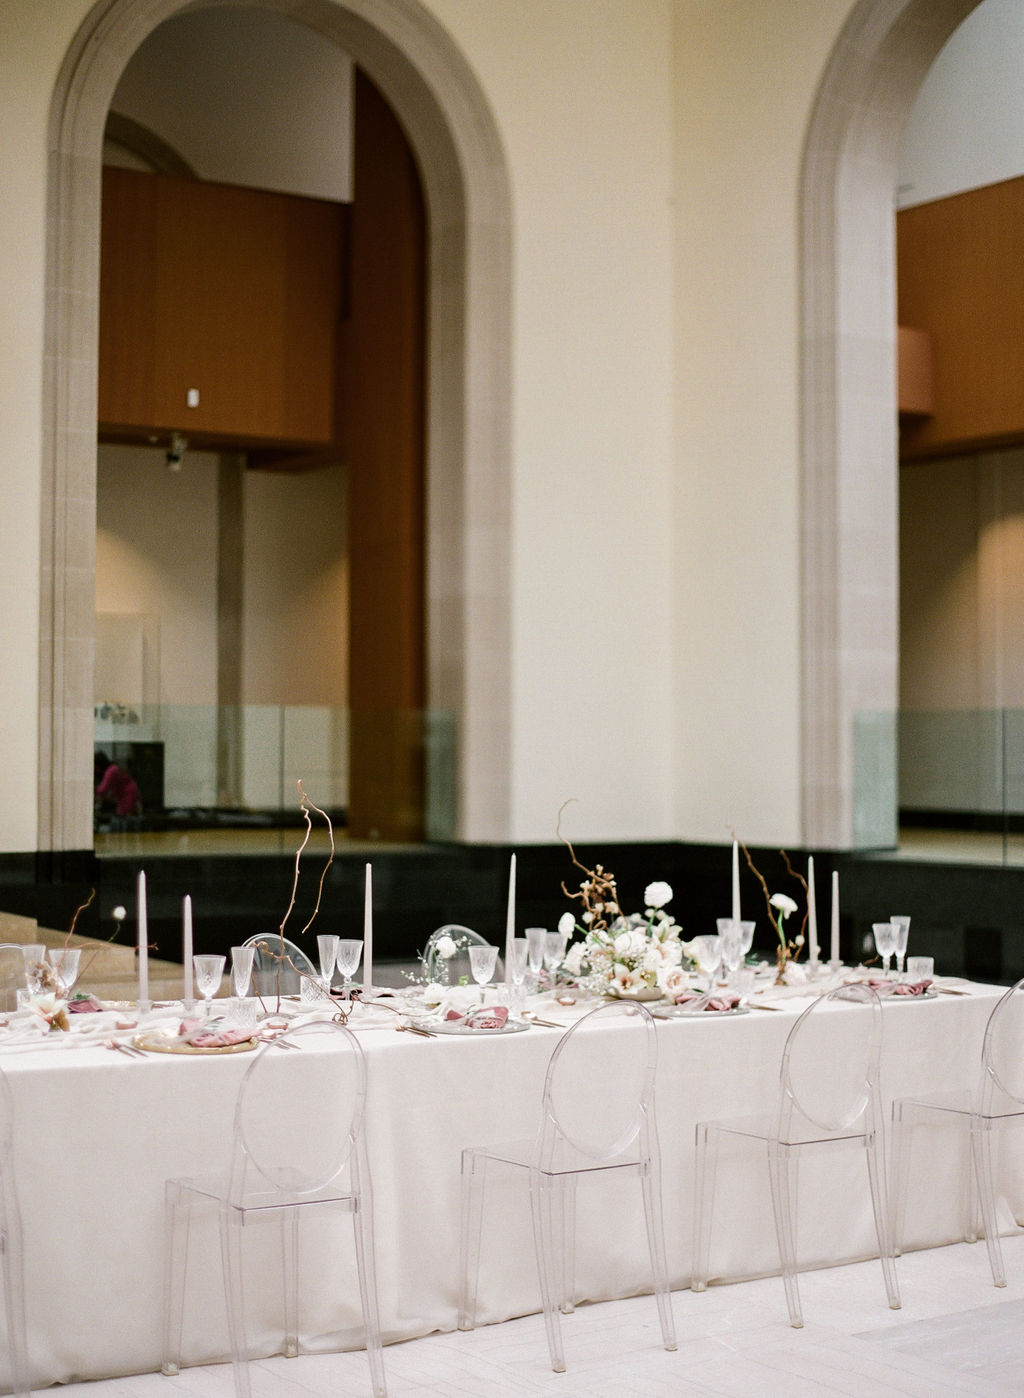 artiese-ago-wedding-editorial-000423720012.jpg